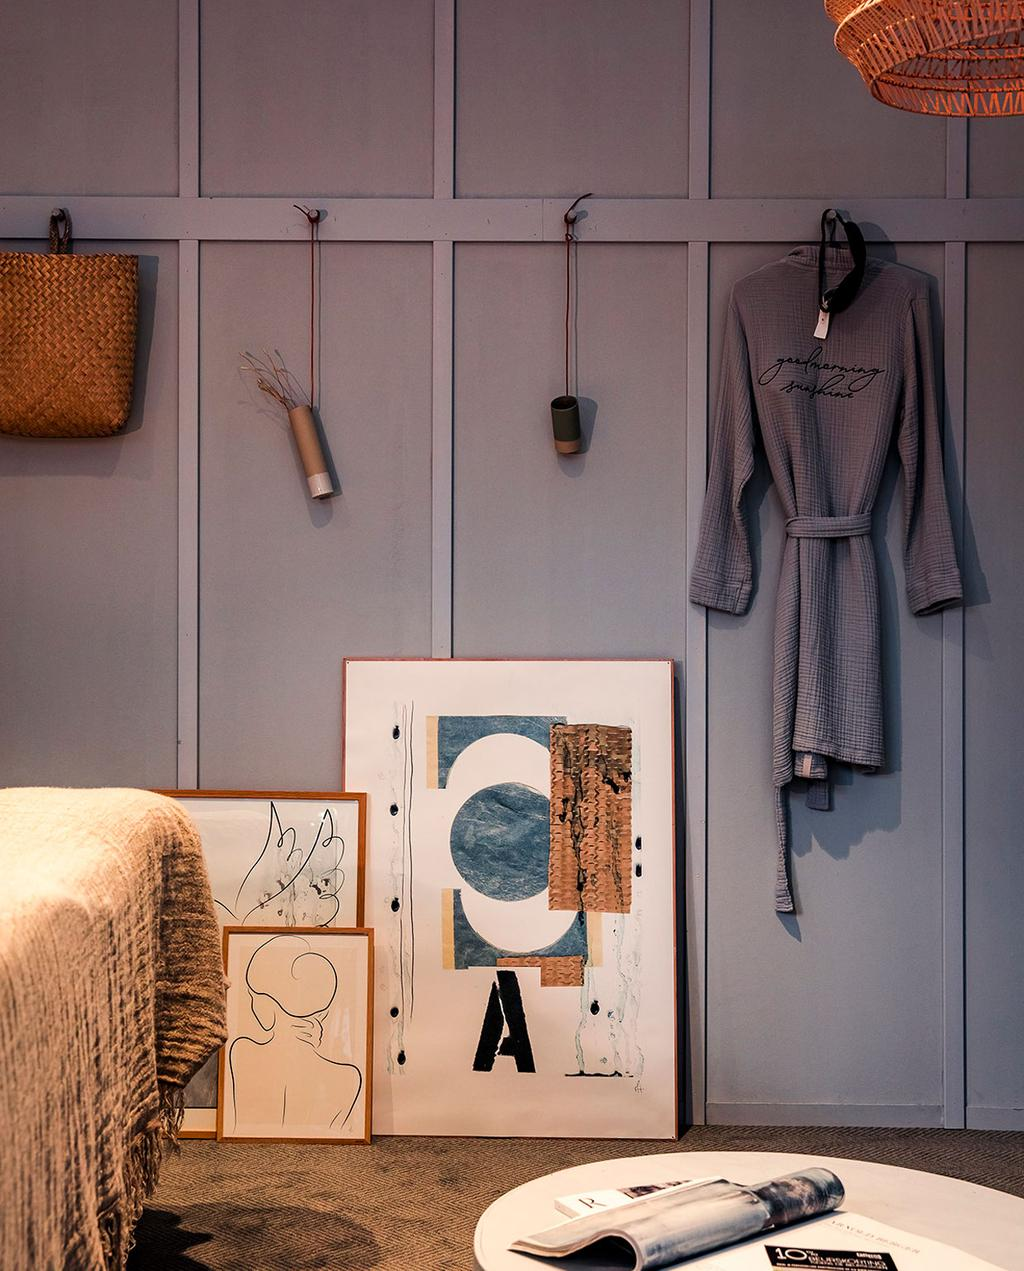 vt wonen&design beurs 2019 basic huis | vtwonen city | Styling Kim van Rossenberg